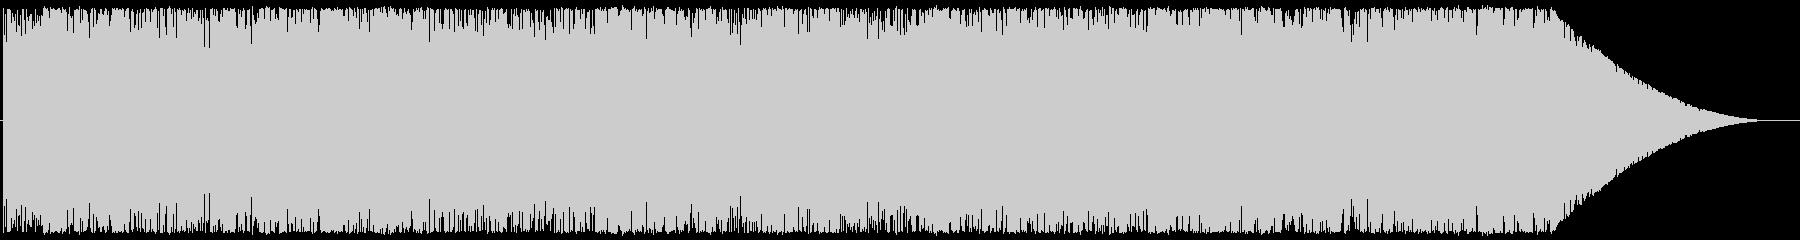 Chill/Healing系シリーズ曲7の未再生の波形